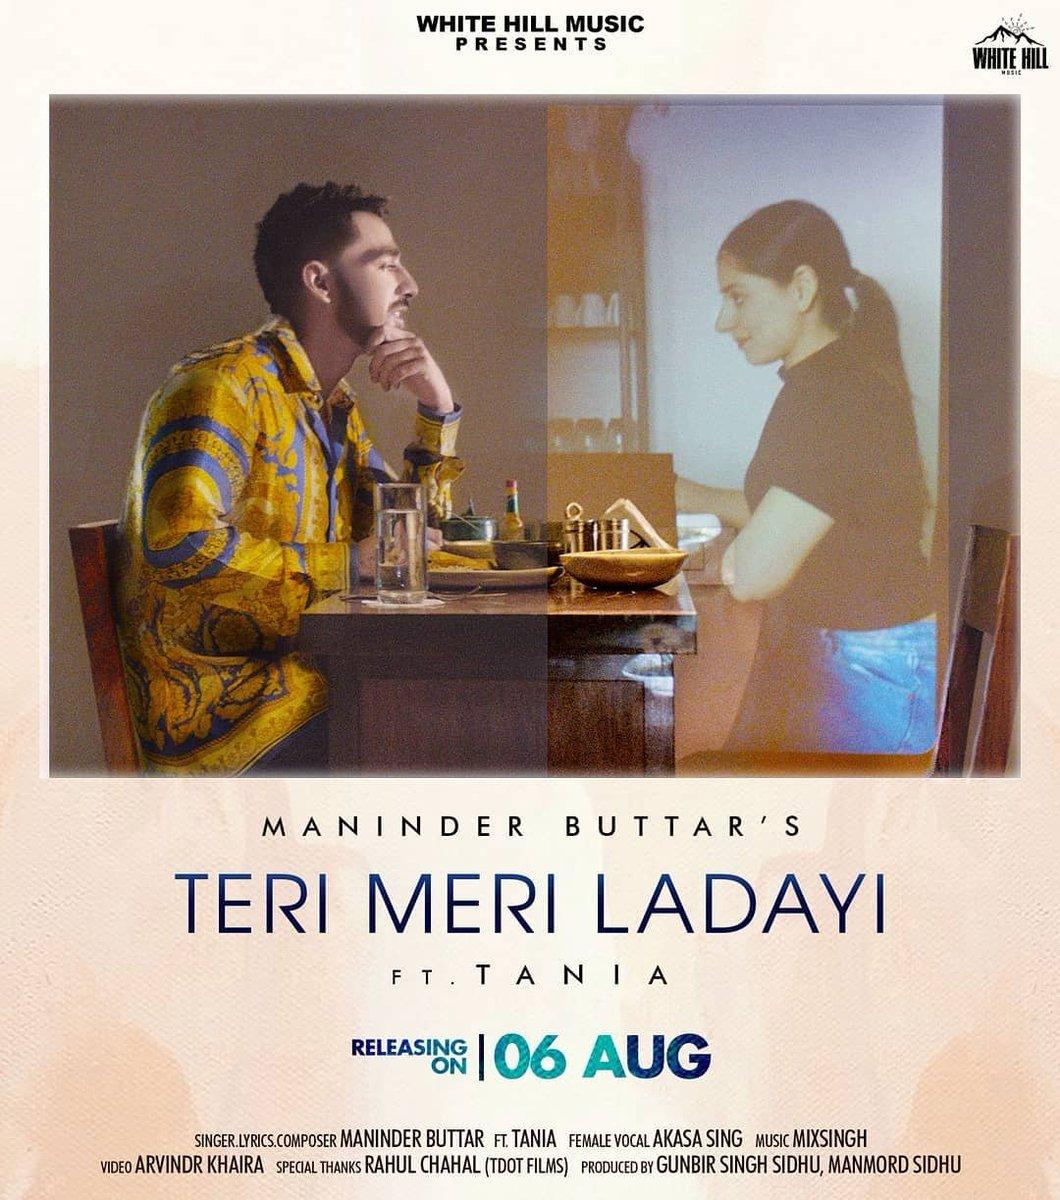 The first track of his album #jugni will release on 6 August . Song :- Teri meri ladayi Singer/Lyrics/composer- #Maninderbuttar  Female vocal - @AkasaSing Music - #mixsingh Video - @arvinderkhaira Label - @WhiteHillMusic_ #Punjabimusic #punjabiartists #punjabisinger #newsongpic.twitter.com/SotkMDmWK1